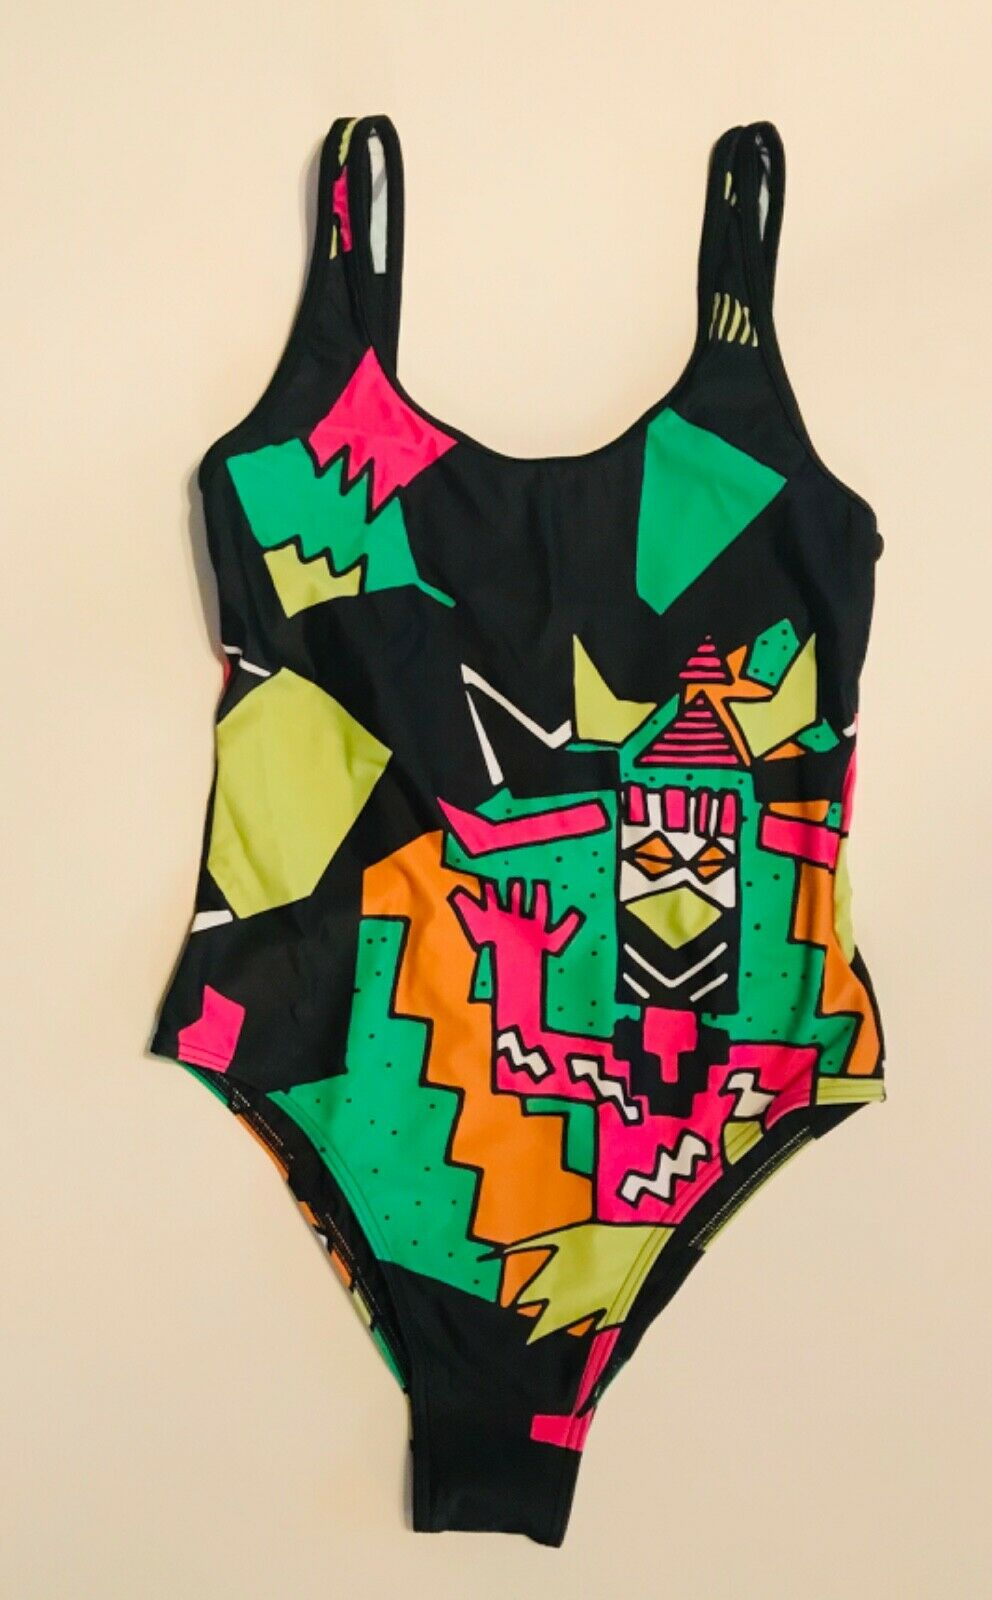 Women's Adidas Multicolor Comic Print Stretch One-Piece Bodysuit Swimsuit L